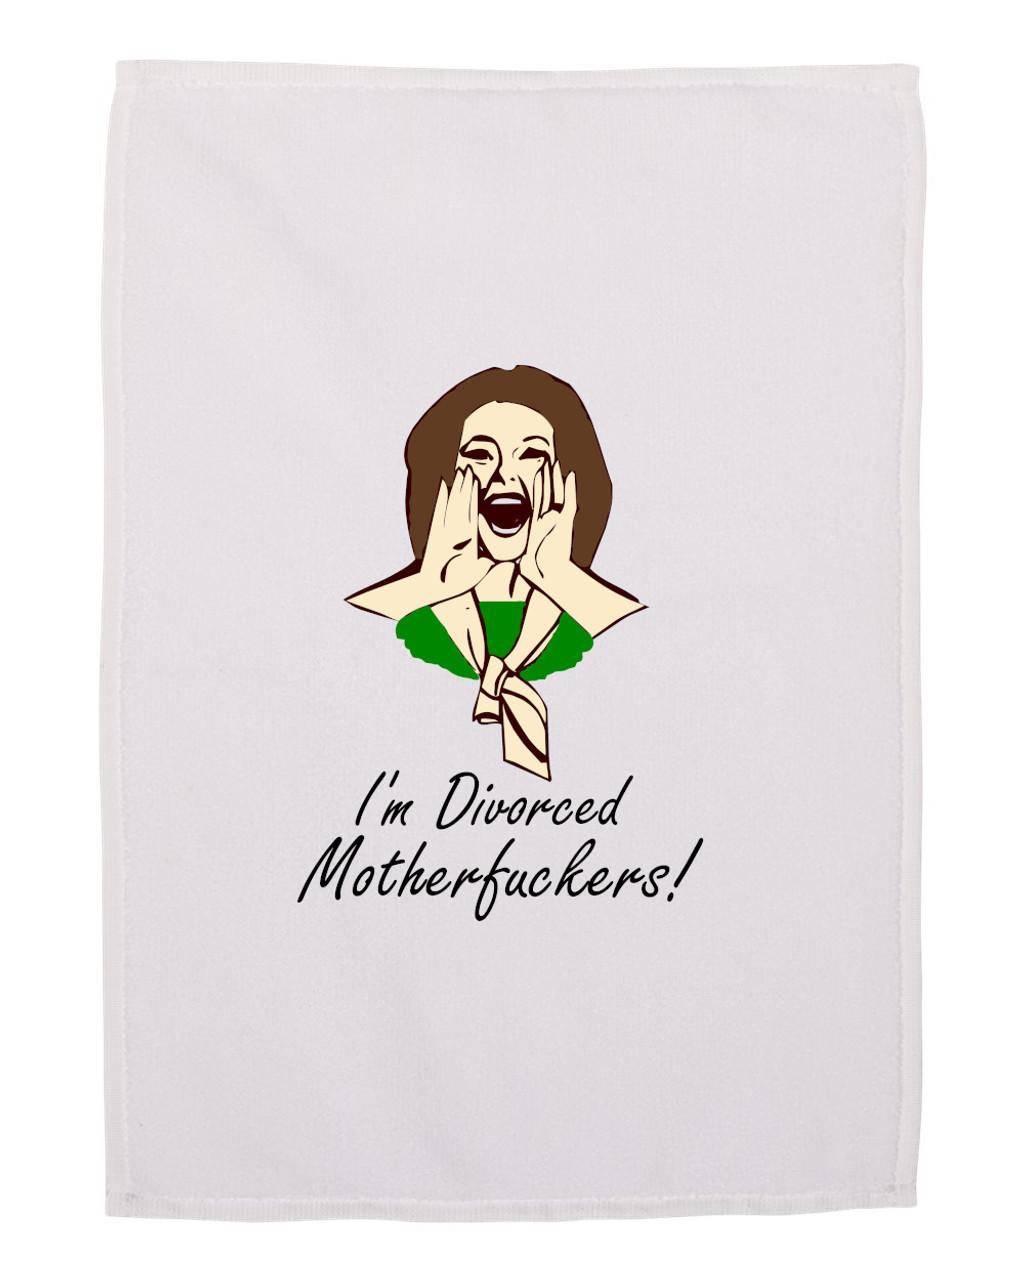 Divorce Gift Hand Towel for Women Divorced Moth*rF*cker White 11x18 Inches